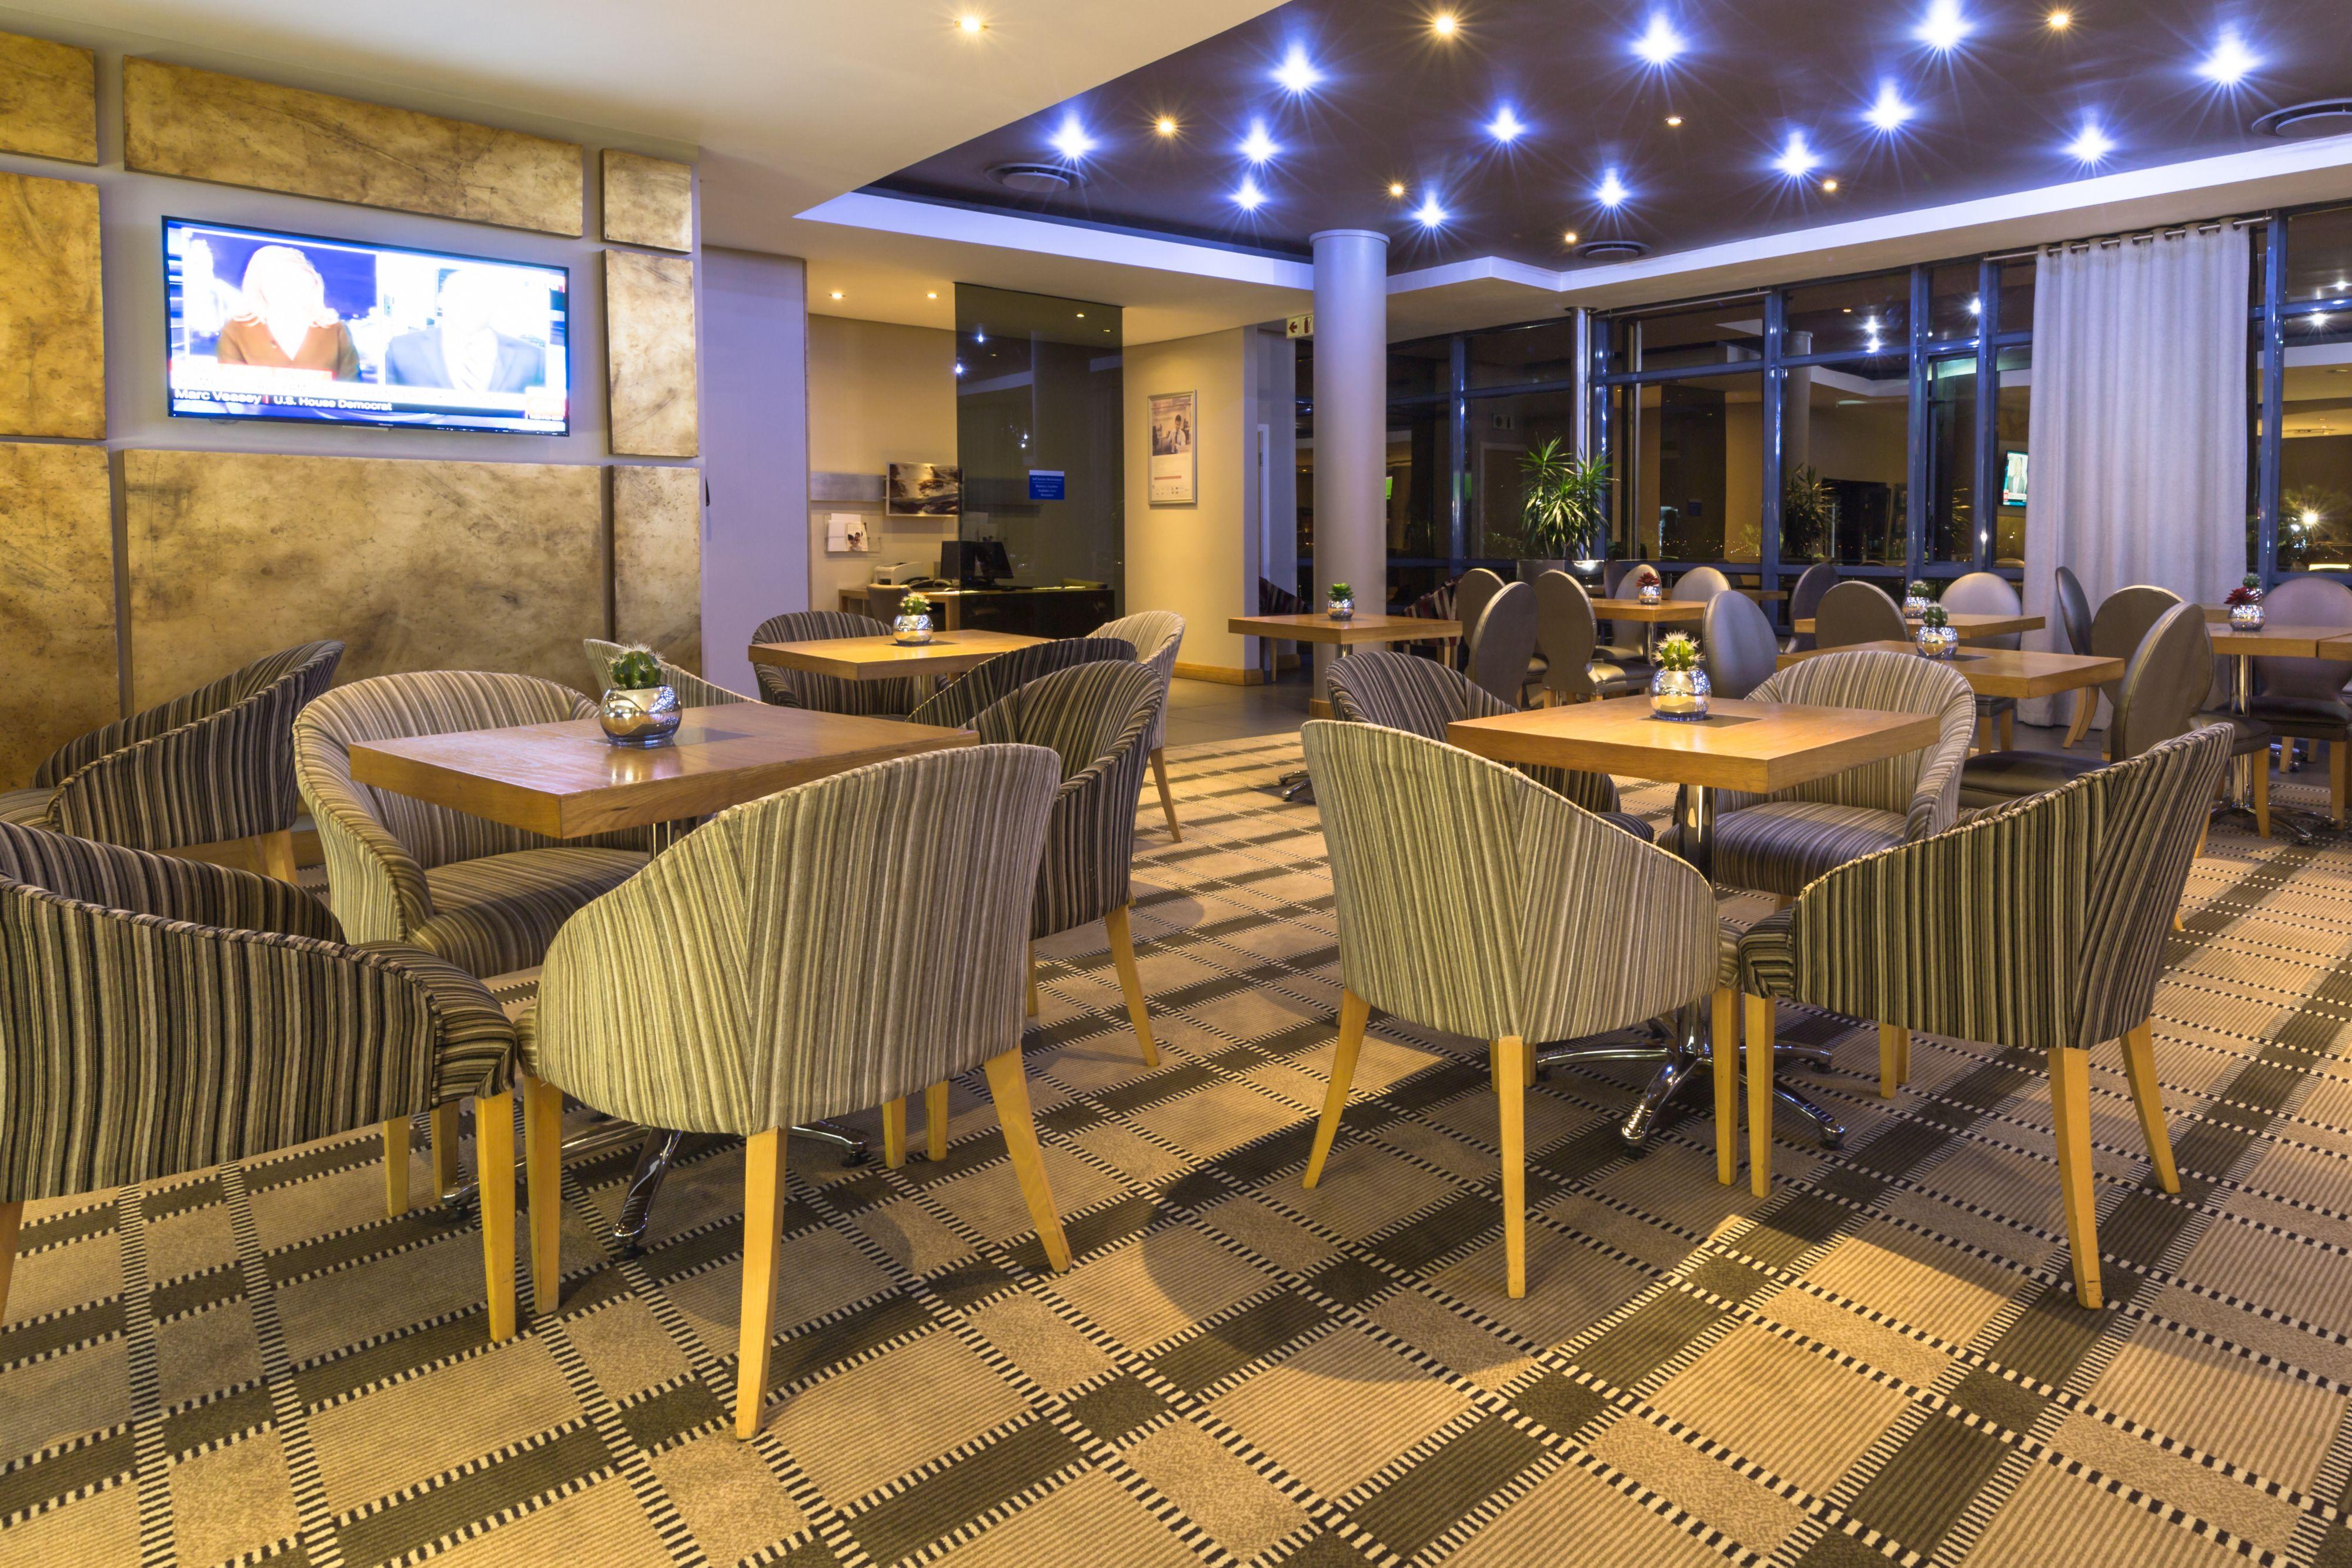 Holiday Inn Express Sandton - Woodmead